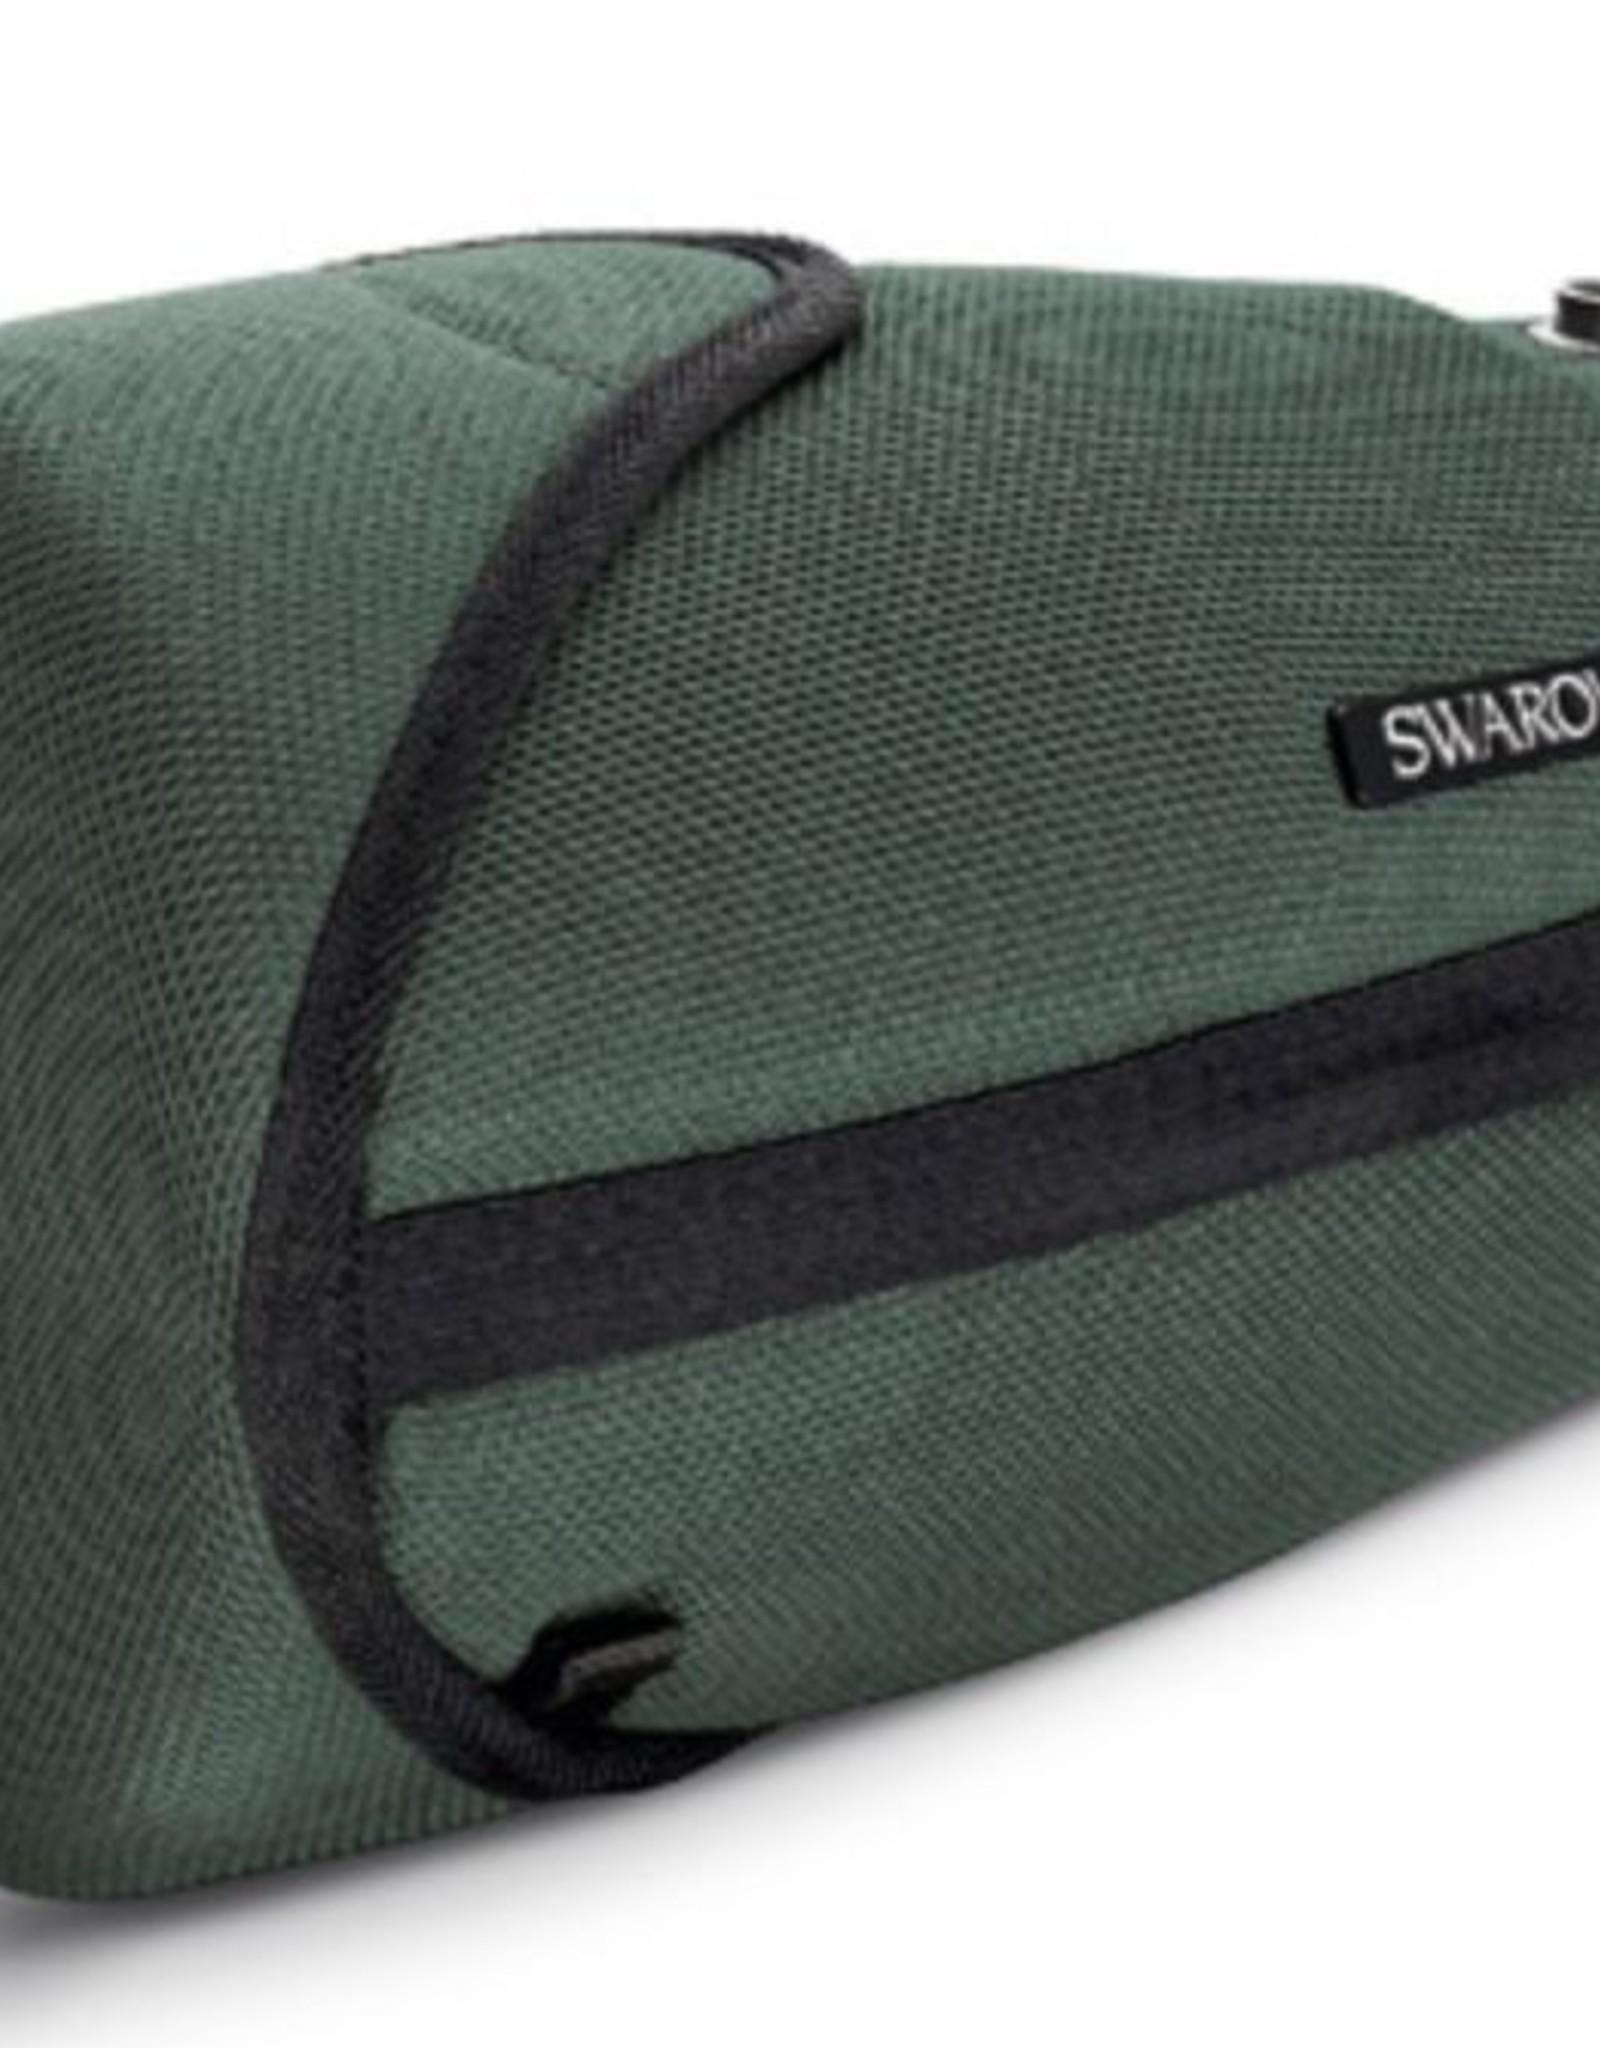 Swarovski Optik Stay On Case 85 Objective